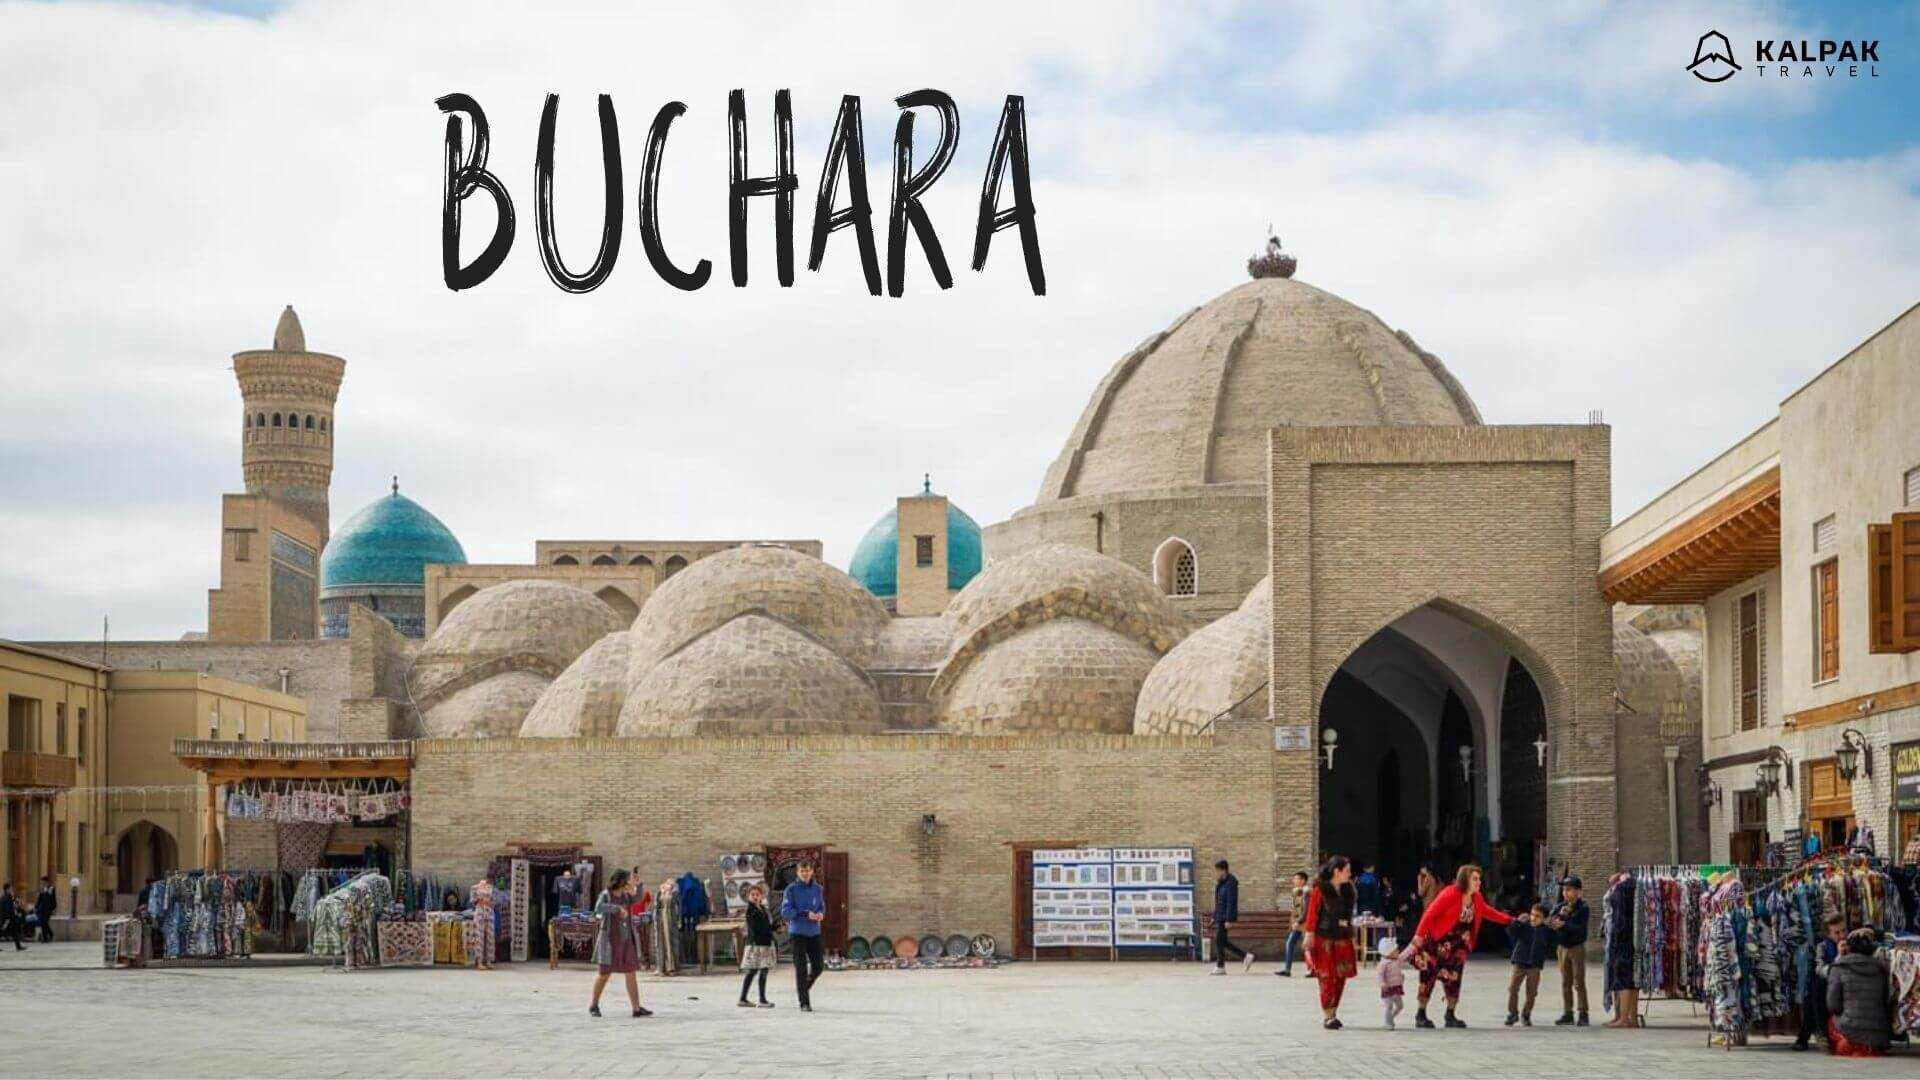 Buchara in Usbekistan